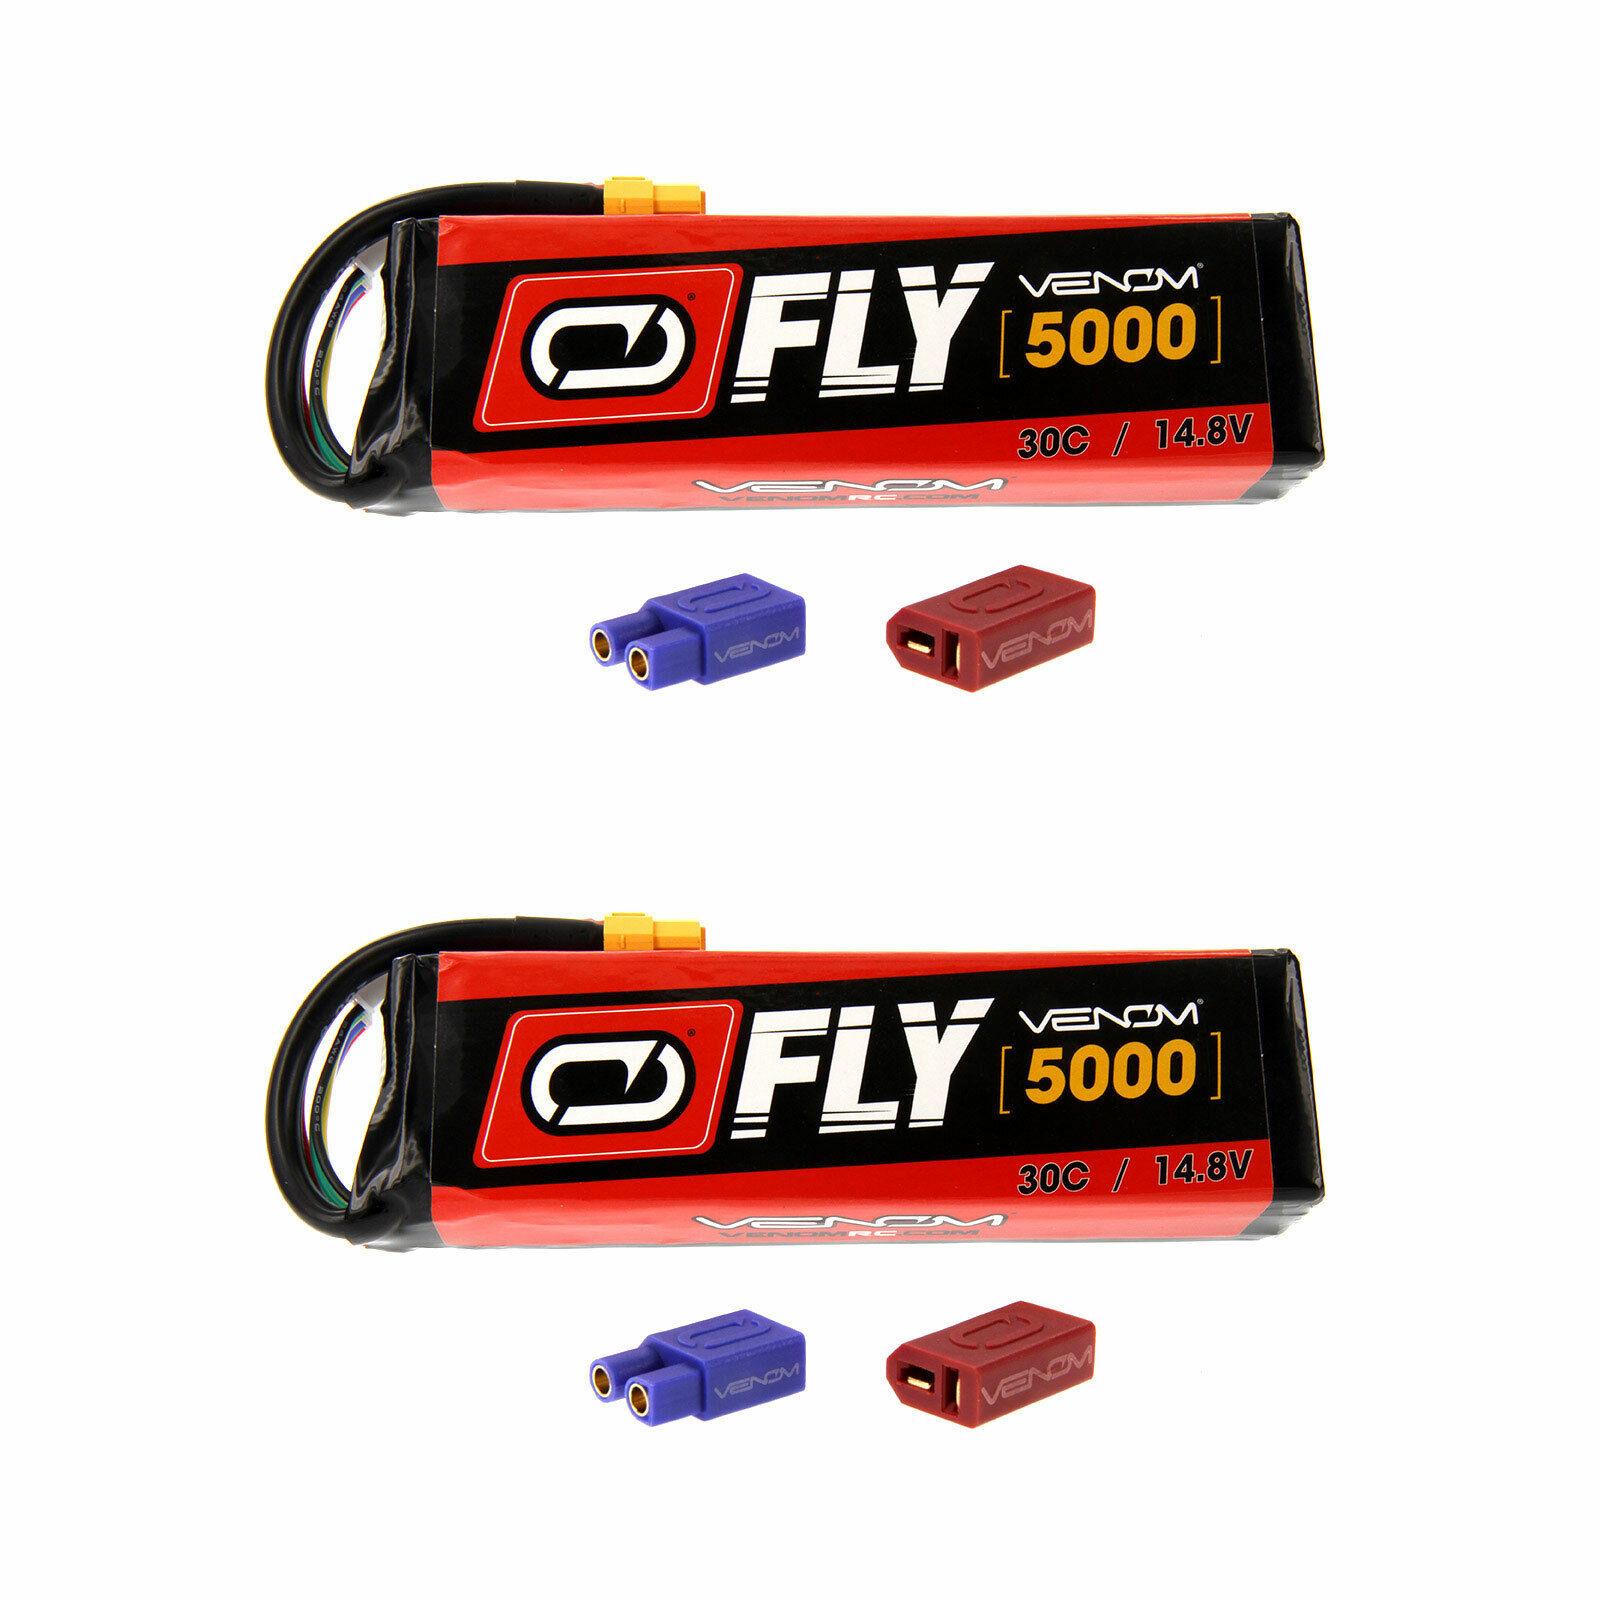 Venom volar 30C 4S 5000mAh 14.8V Batería Lipo Con Enchufe x2 Uni 2.0 paquetes